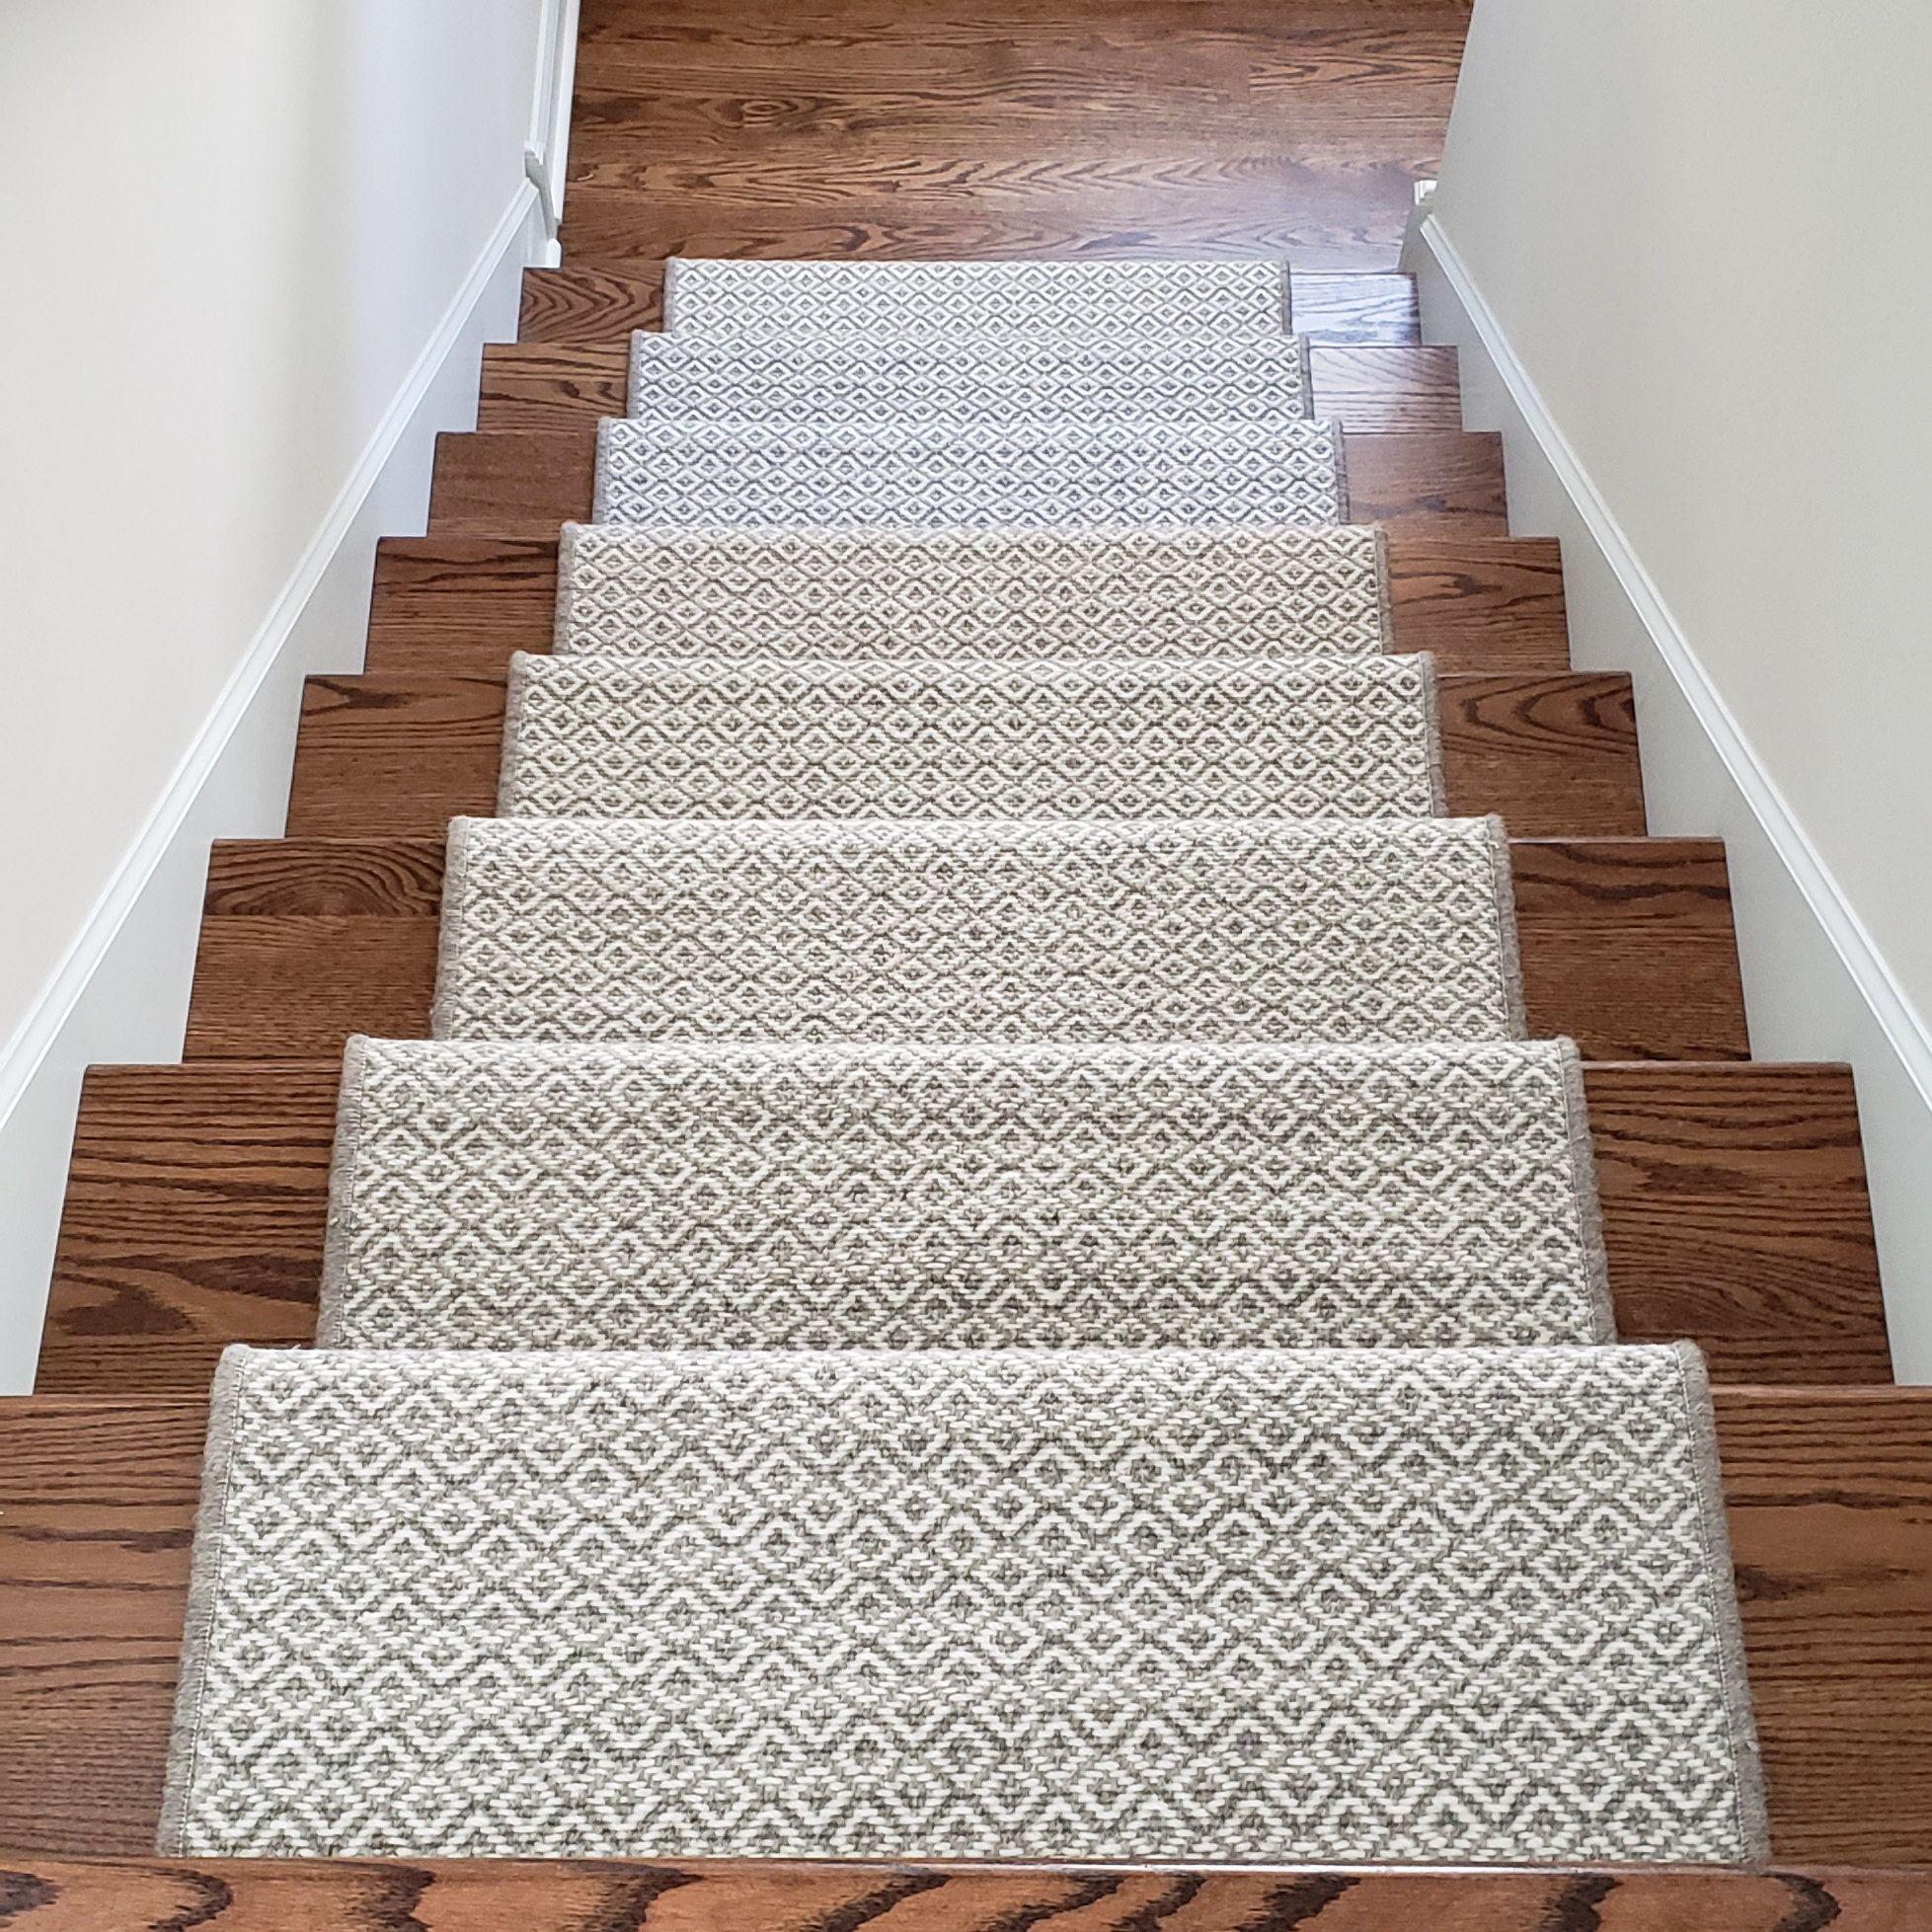 Padded Wool Carpet Stair Treads Breckenridge Grey Medium Etsy   Wool Carpet Stair Treads   Zealand Wool   Bullnose Padded   Flooring   Plush Carpet   Cat Pet